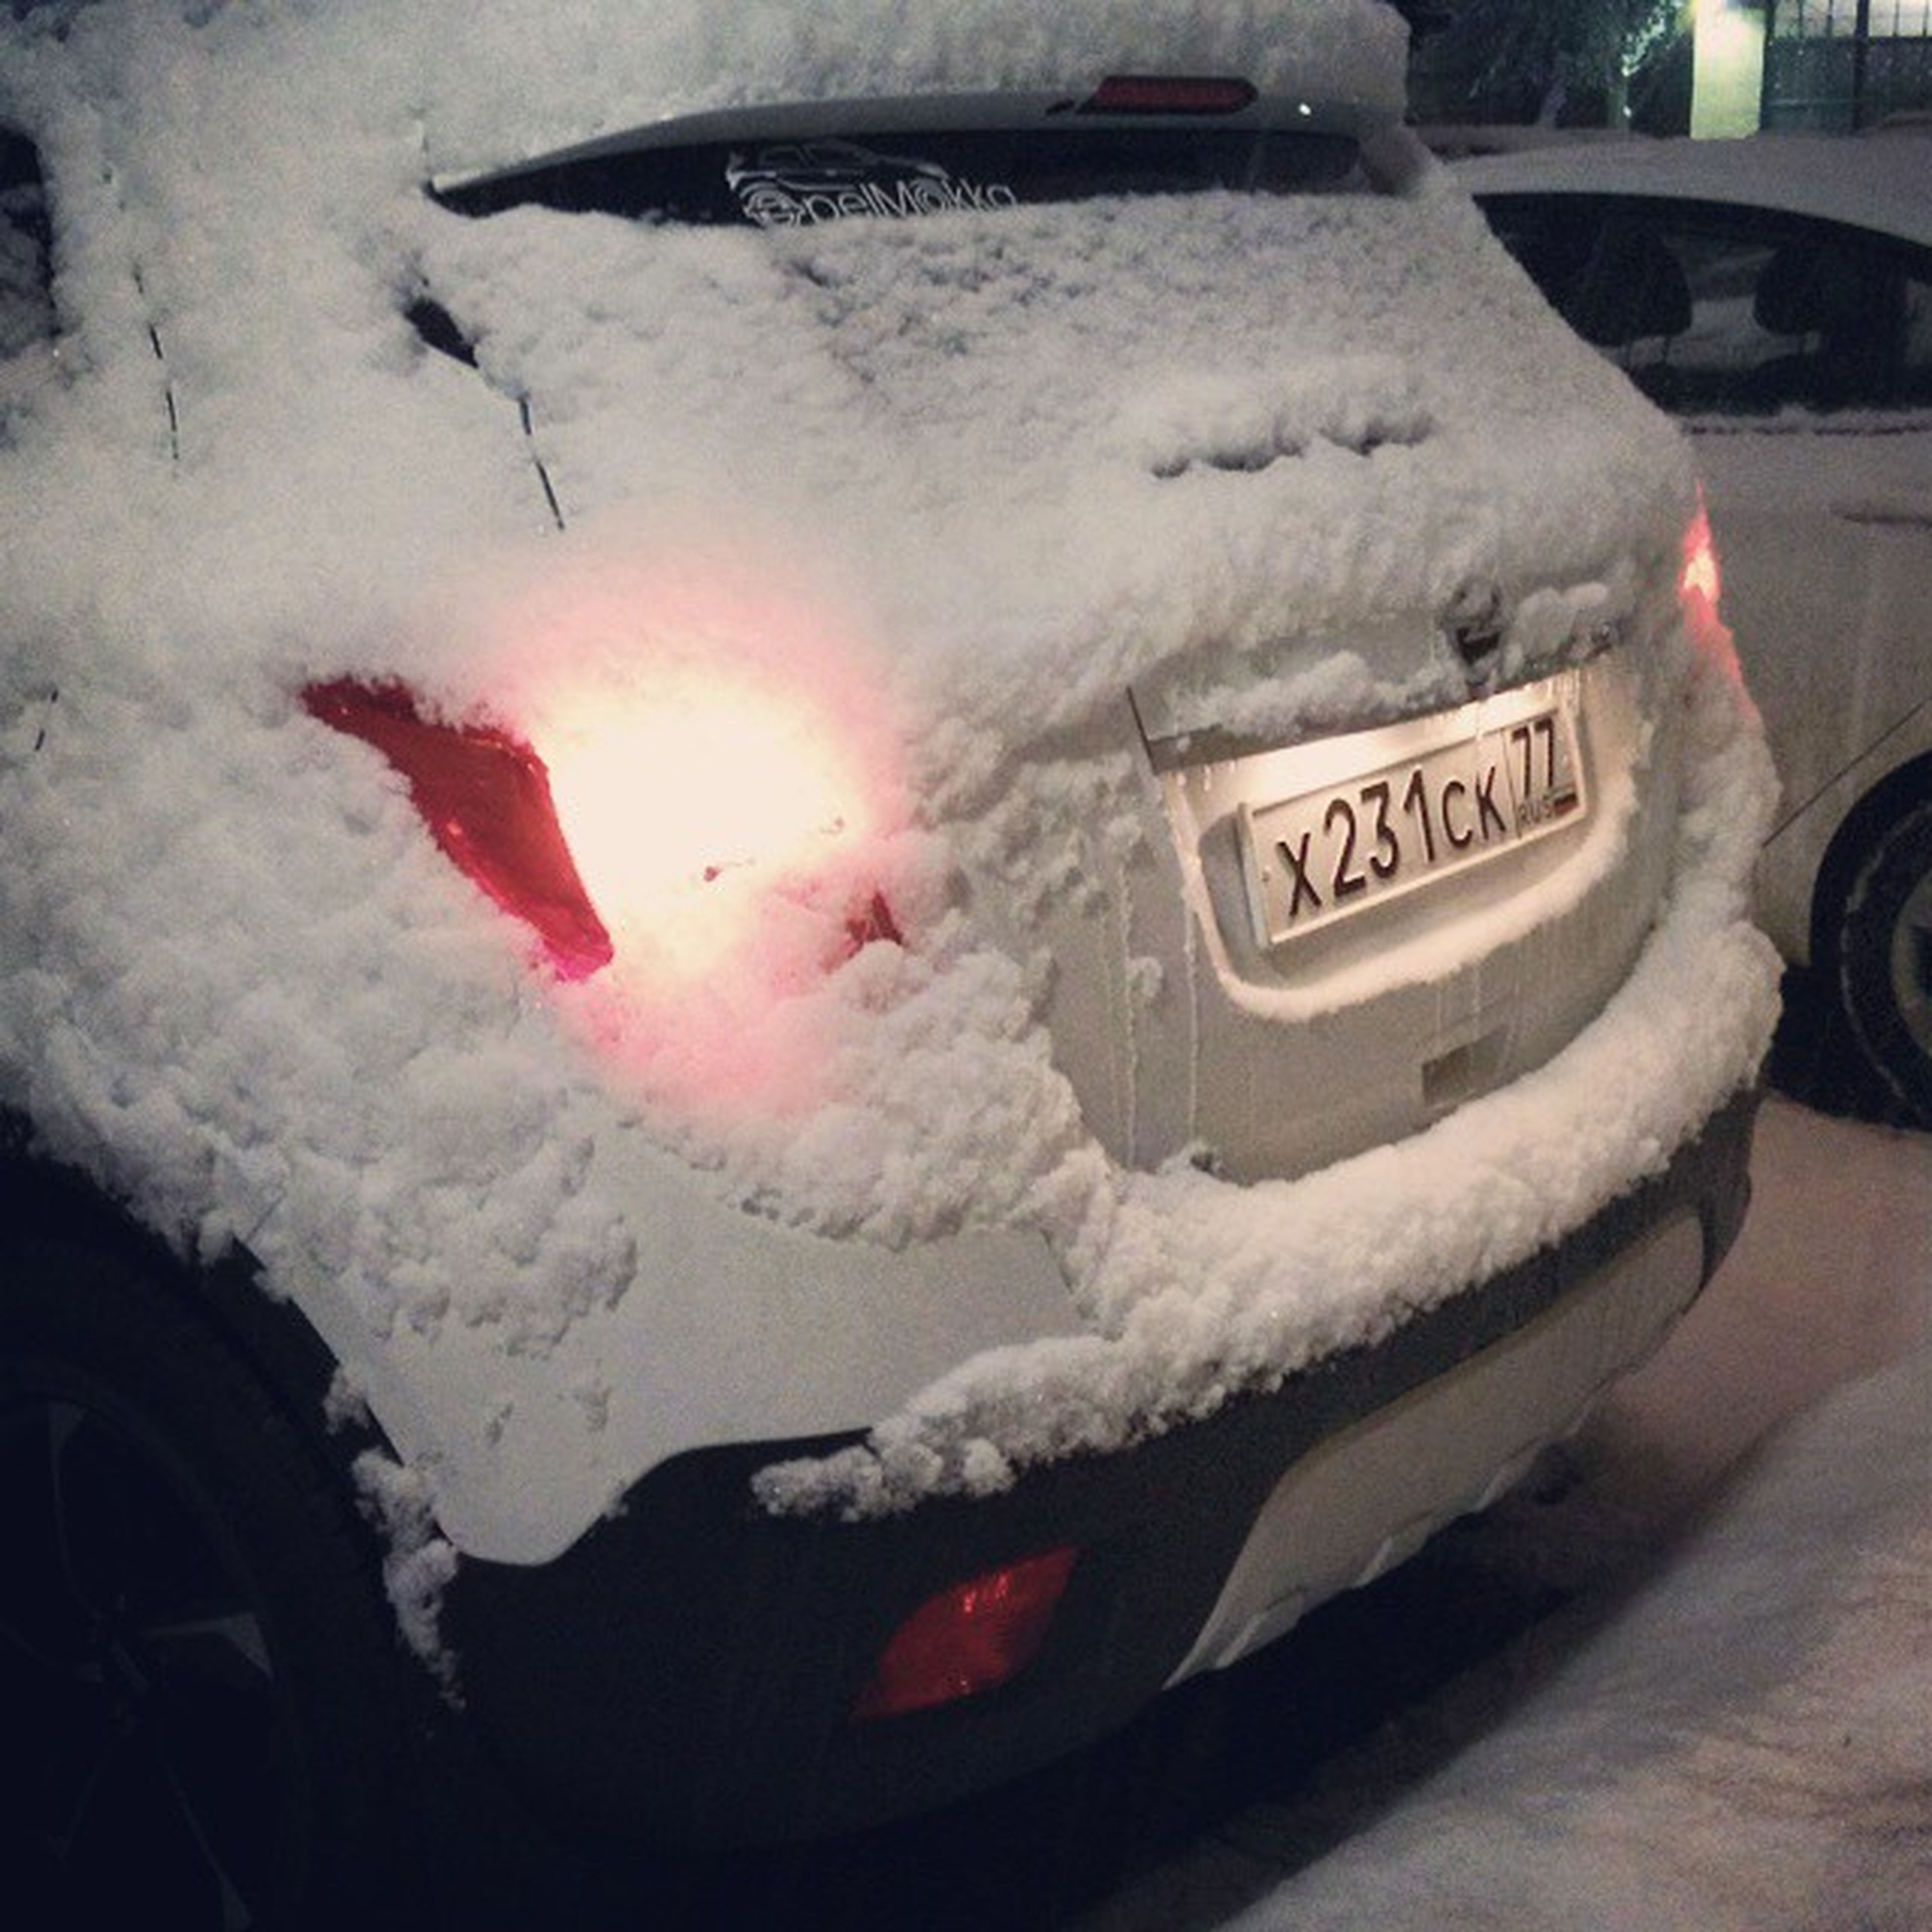 MokkaDay 406: привет, снеговик! опель Мокка опельмокка Opel Mokka Opelmokka MokkaClub MokkaRussia MokkaNation